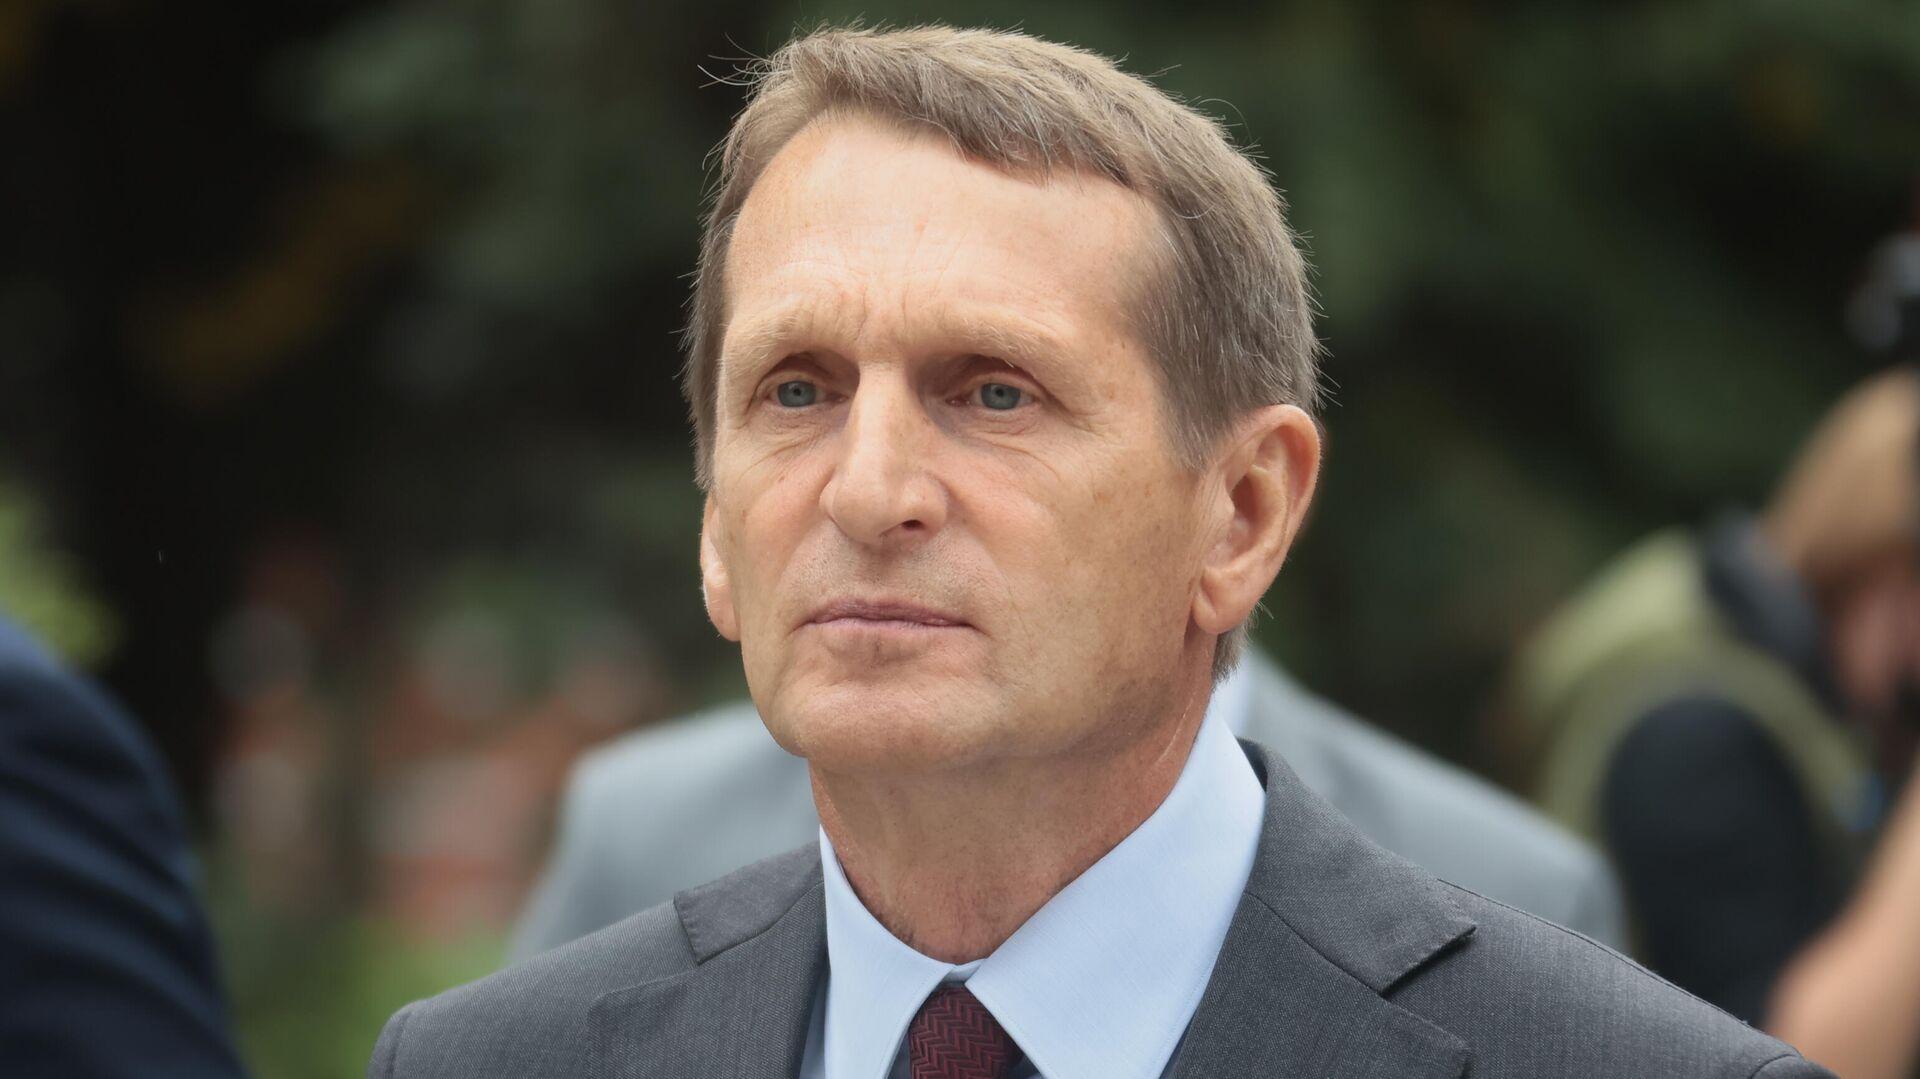 Serguéi Narishkin, director del Servicio de Inteligencia Exterior de Rusia - Sputnik Mundo, 1920, 26.09.2021